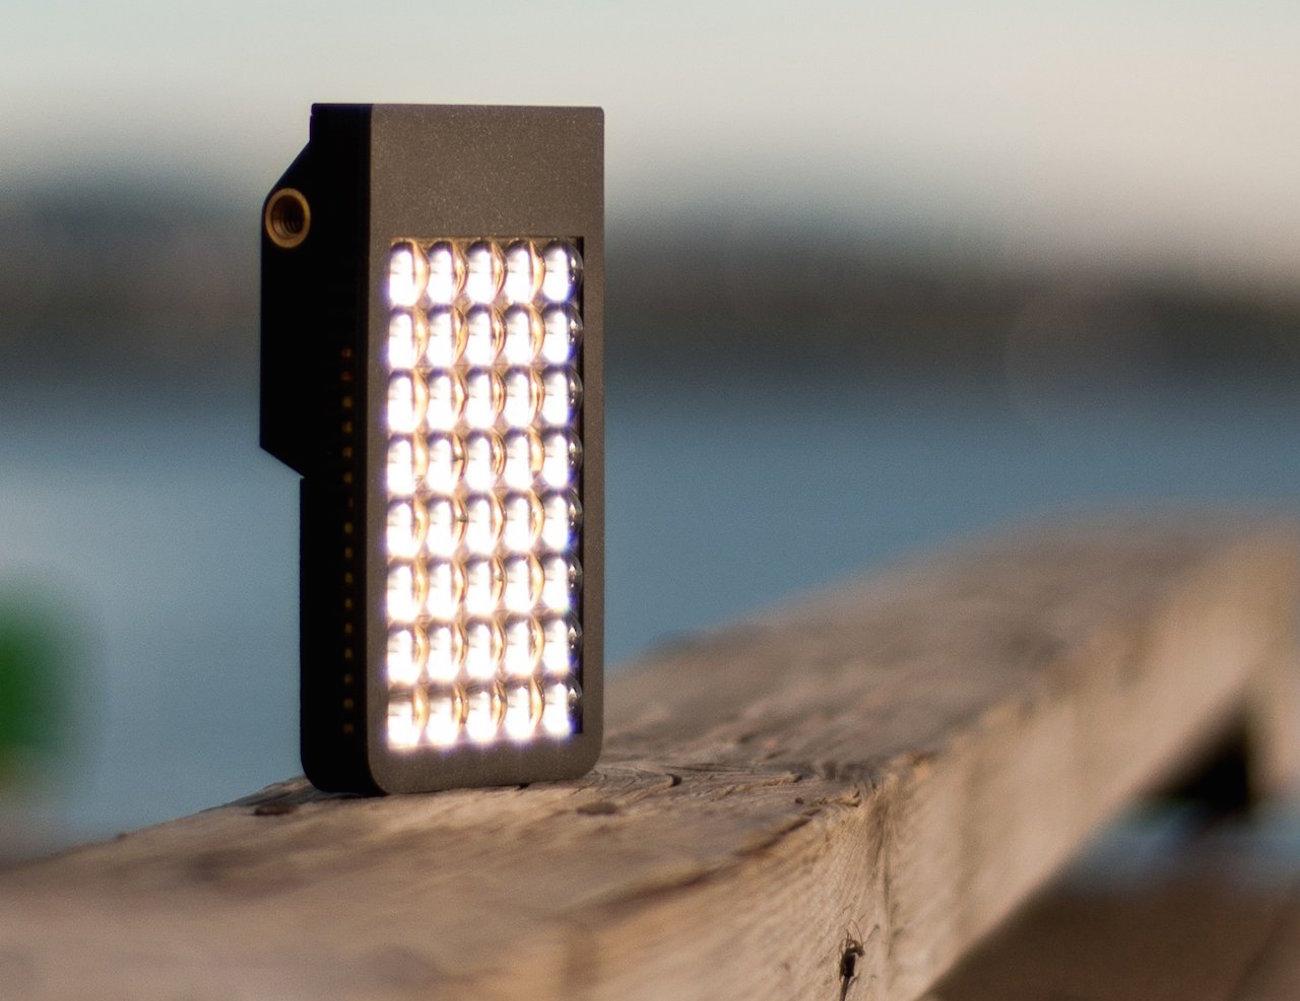 KICK+Pocket+Lighting+Studio+%26%238211%3B+Great+Tool+For+Smartphone+Photography